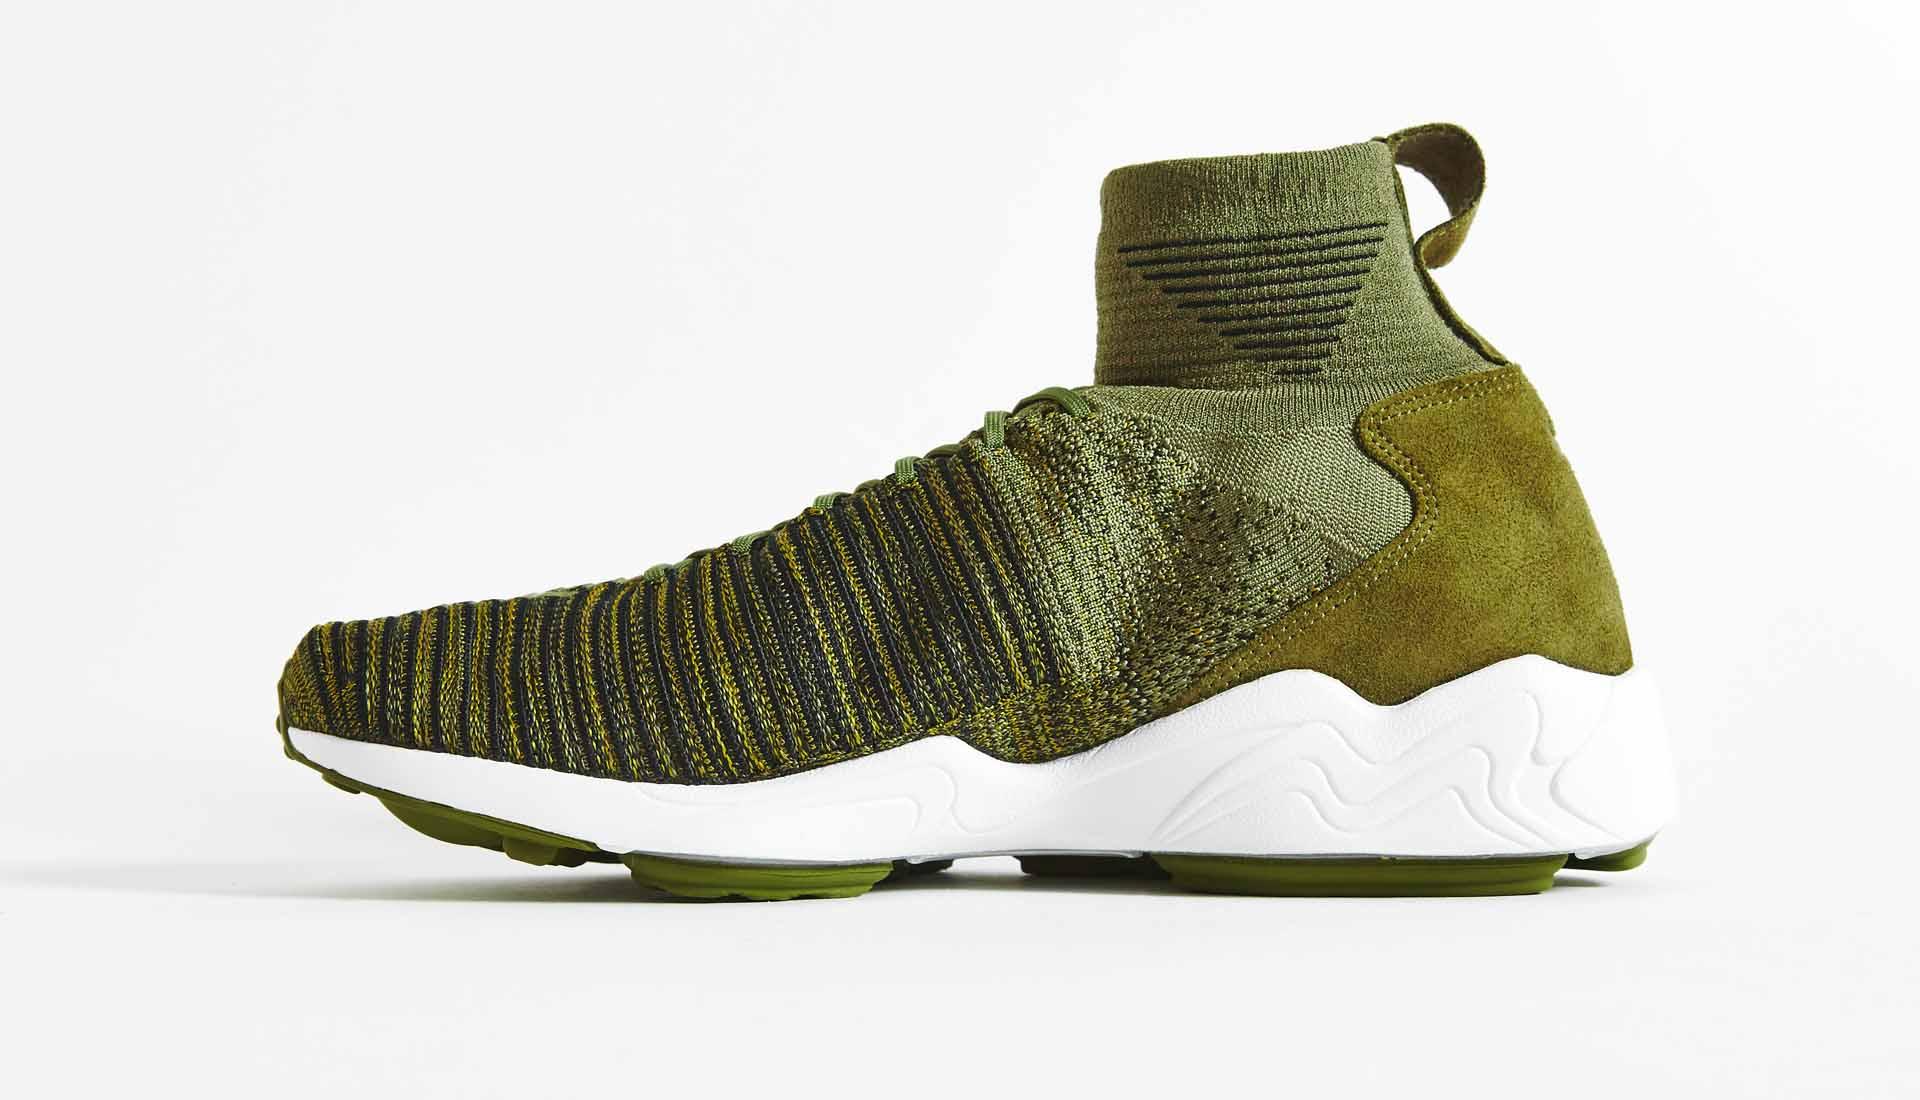 Turf Empire Nike Mercurial Zoom Flyknit Olive 1.jpg